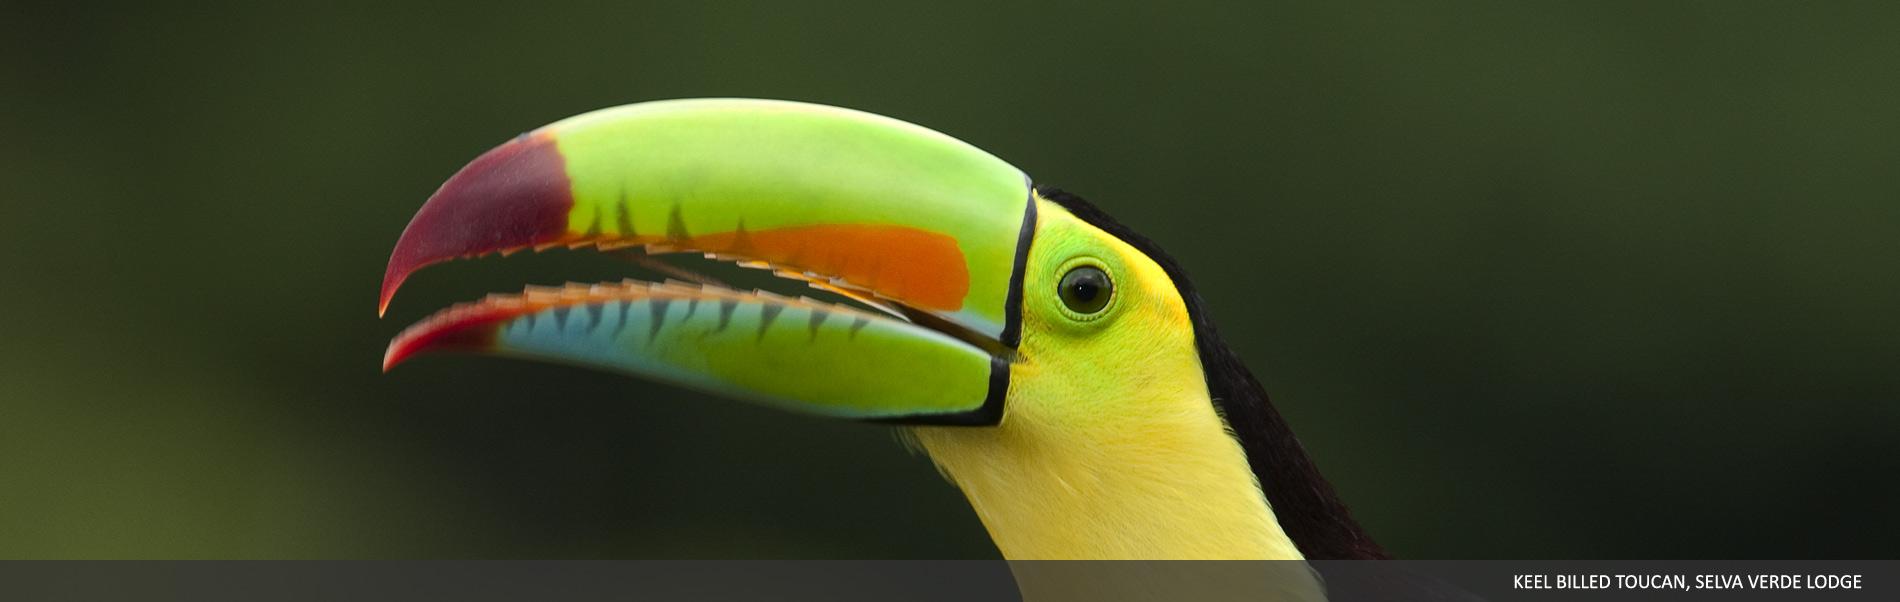 selvaverde-costarica-00